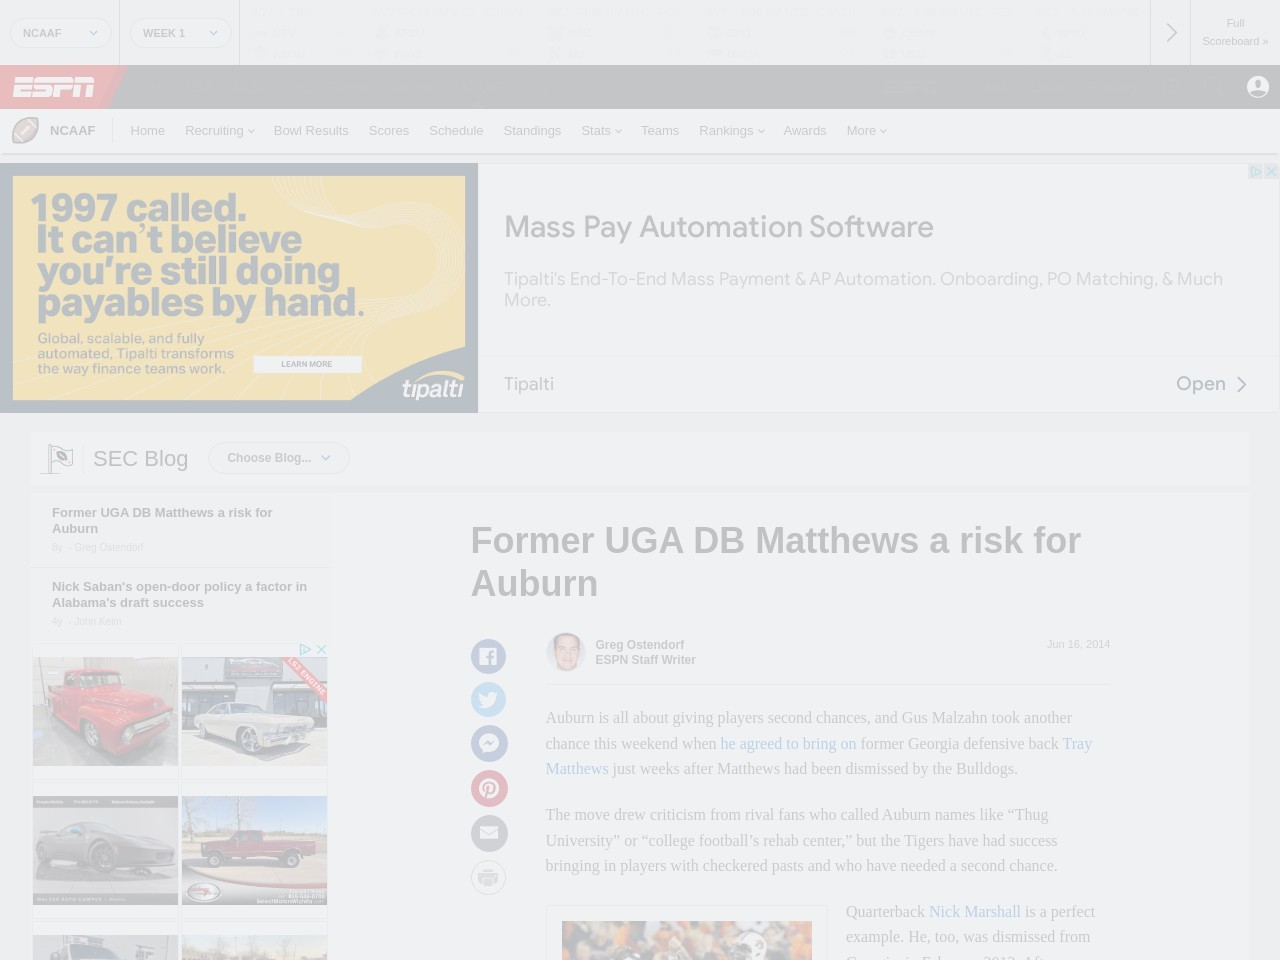 Former UGA DB Matthews a risk for Auburn